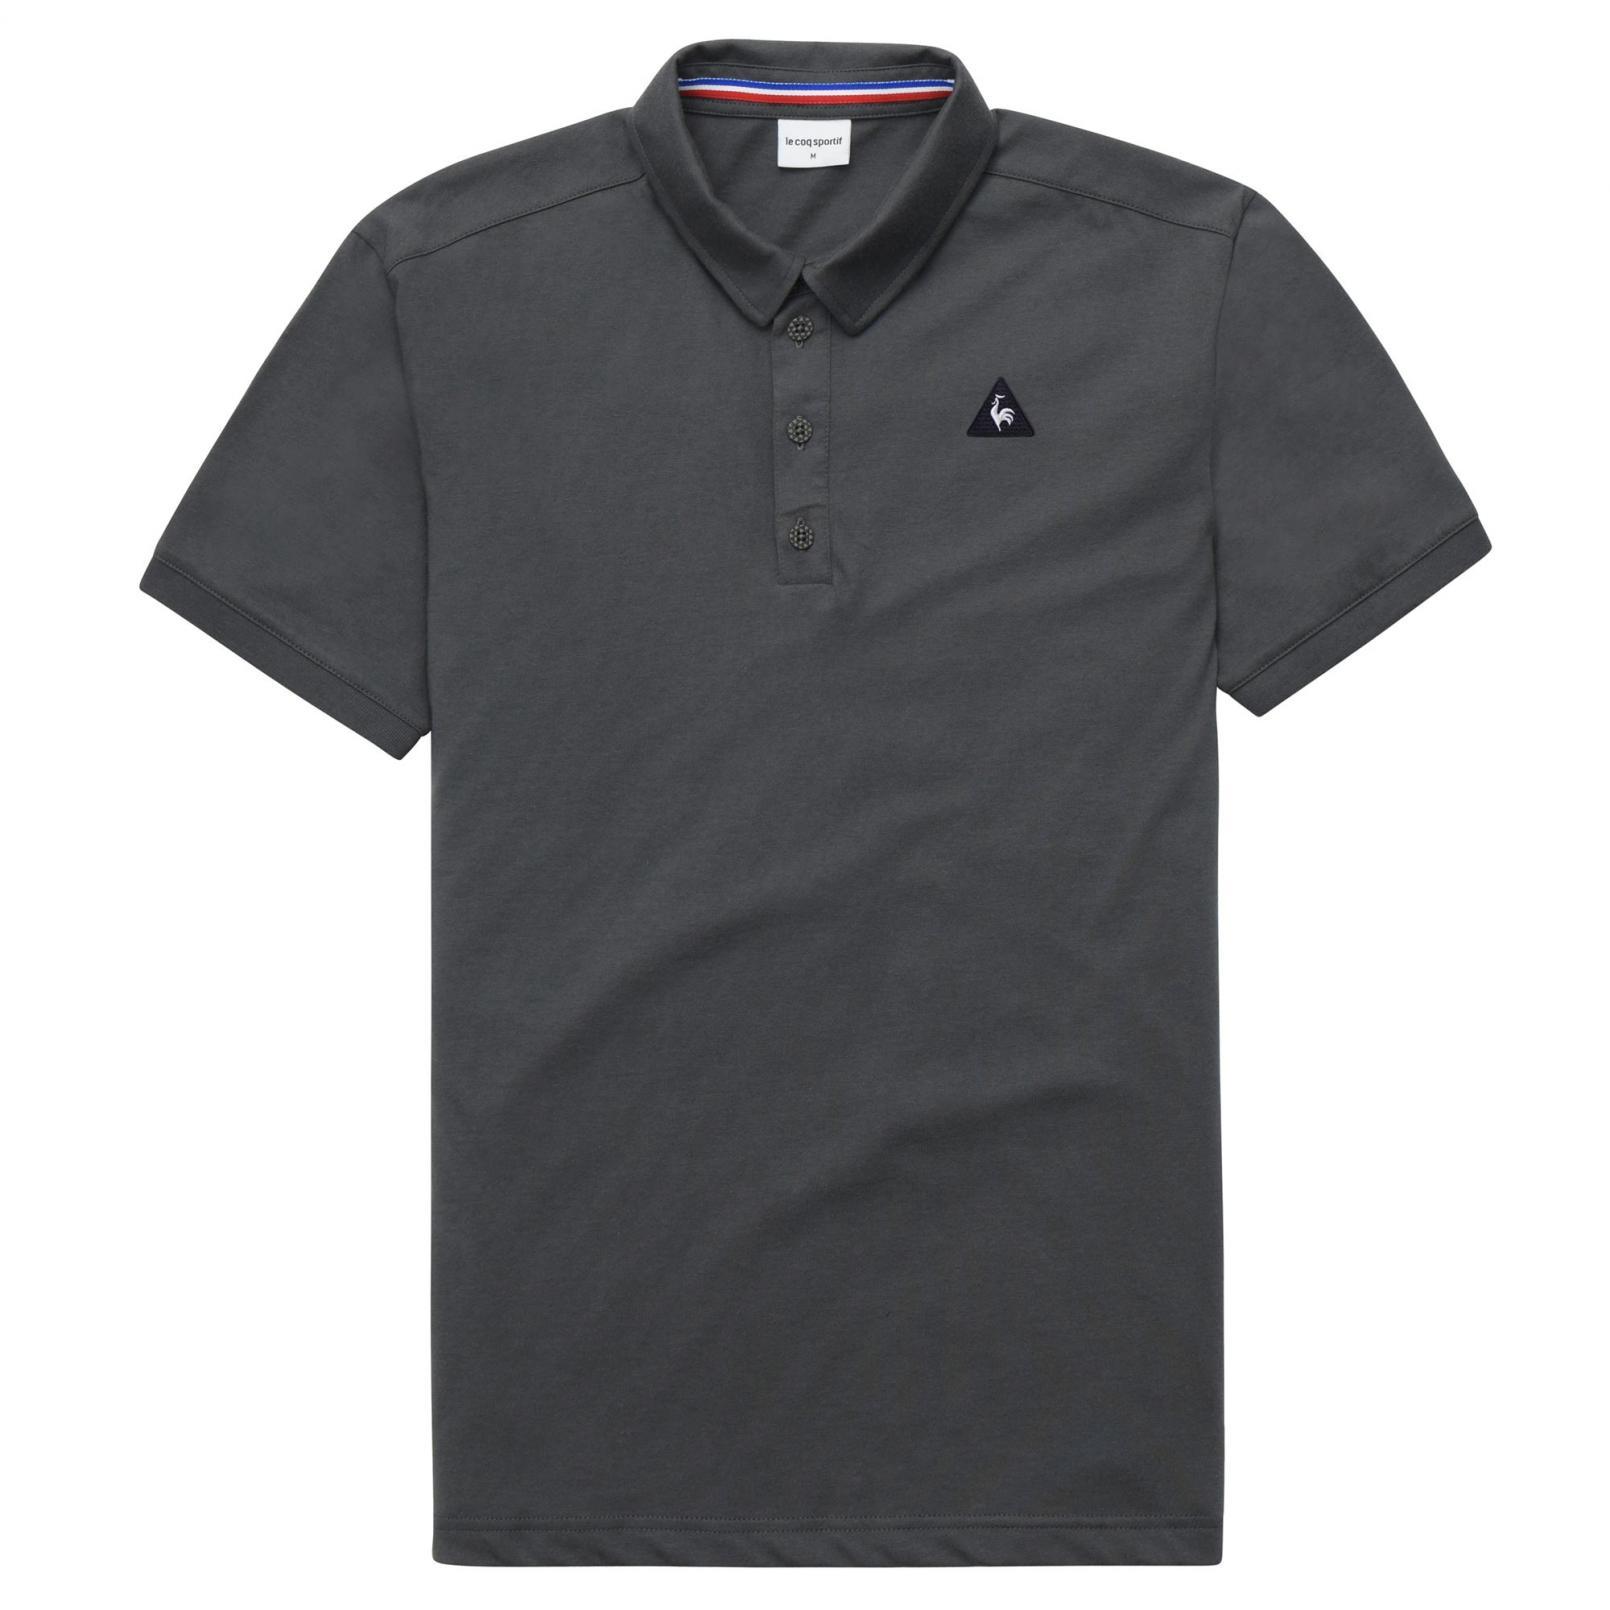 Polo – Le Coq Sportif Essentiels Polo Grey/Black